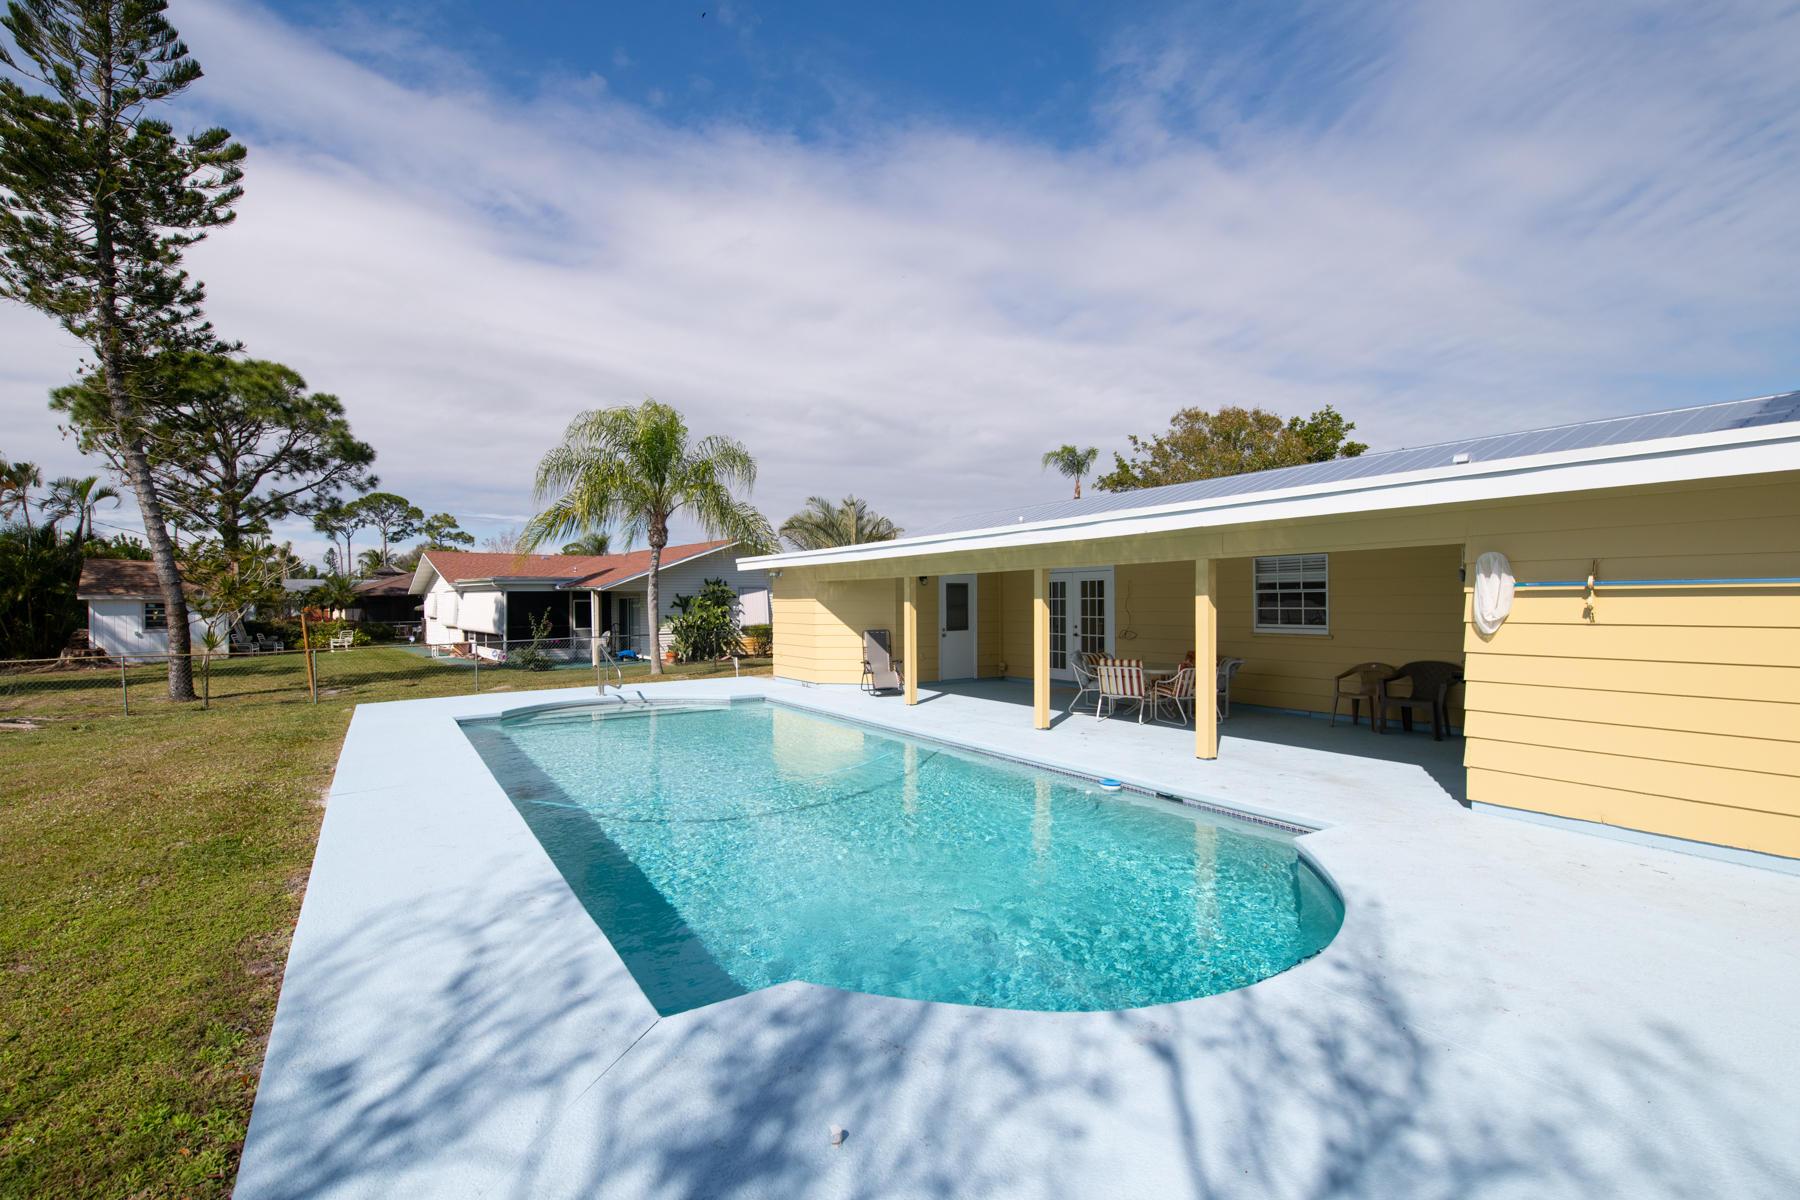 Port Saint Lucie Homes for Sale -  Pool,  2492 SE Pinero Road